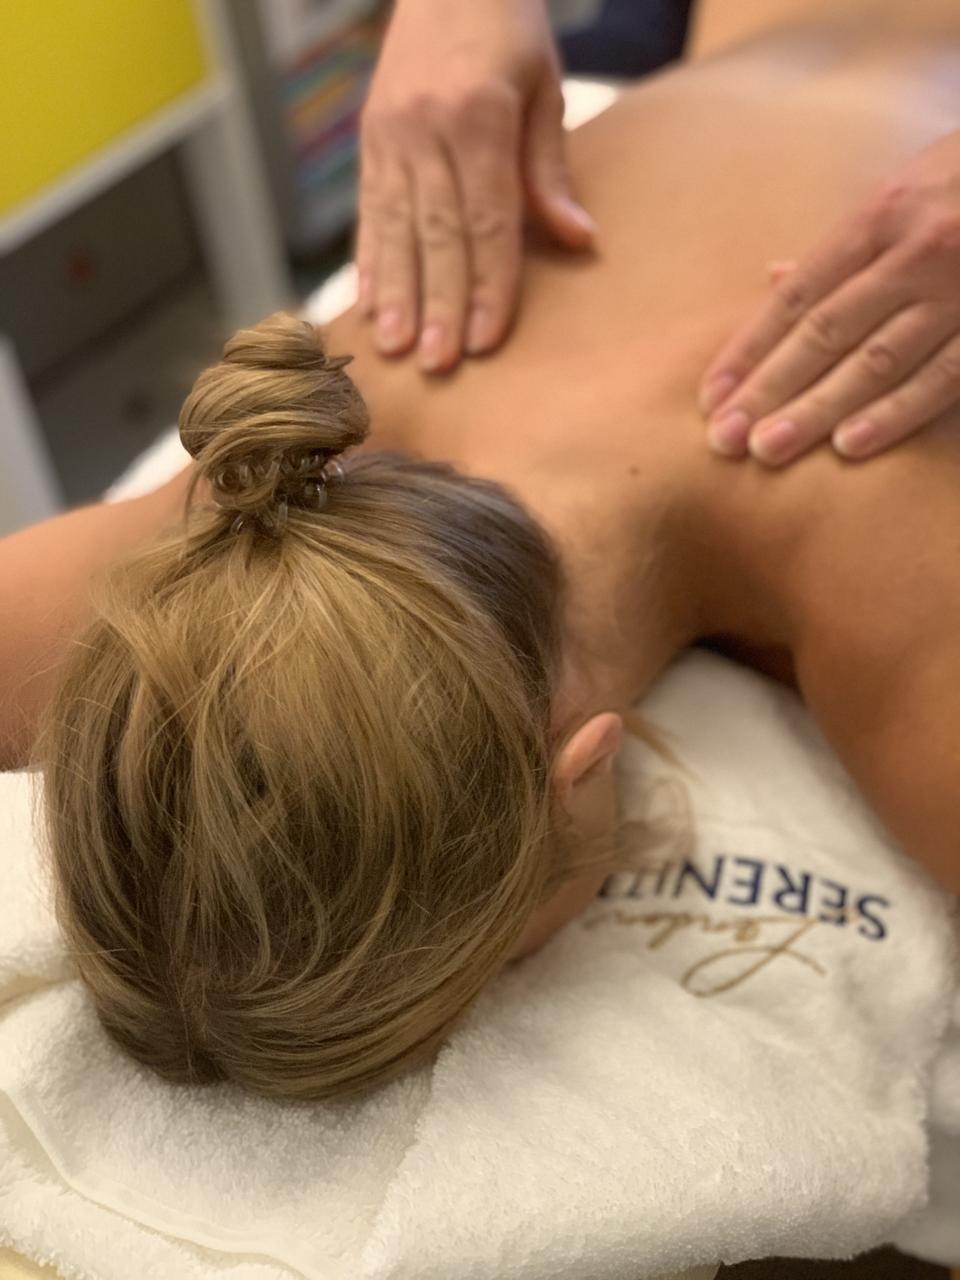 Deep tissue massage by London Serenity